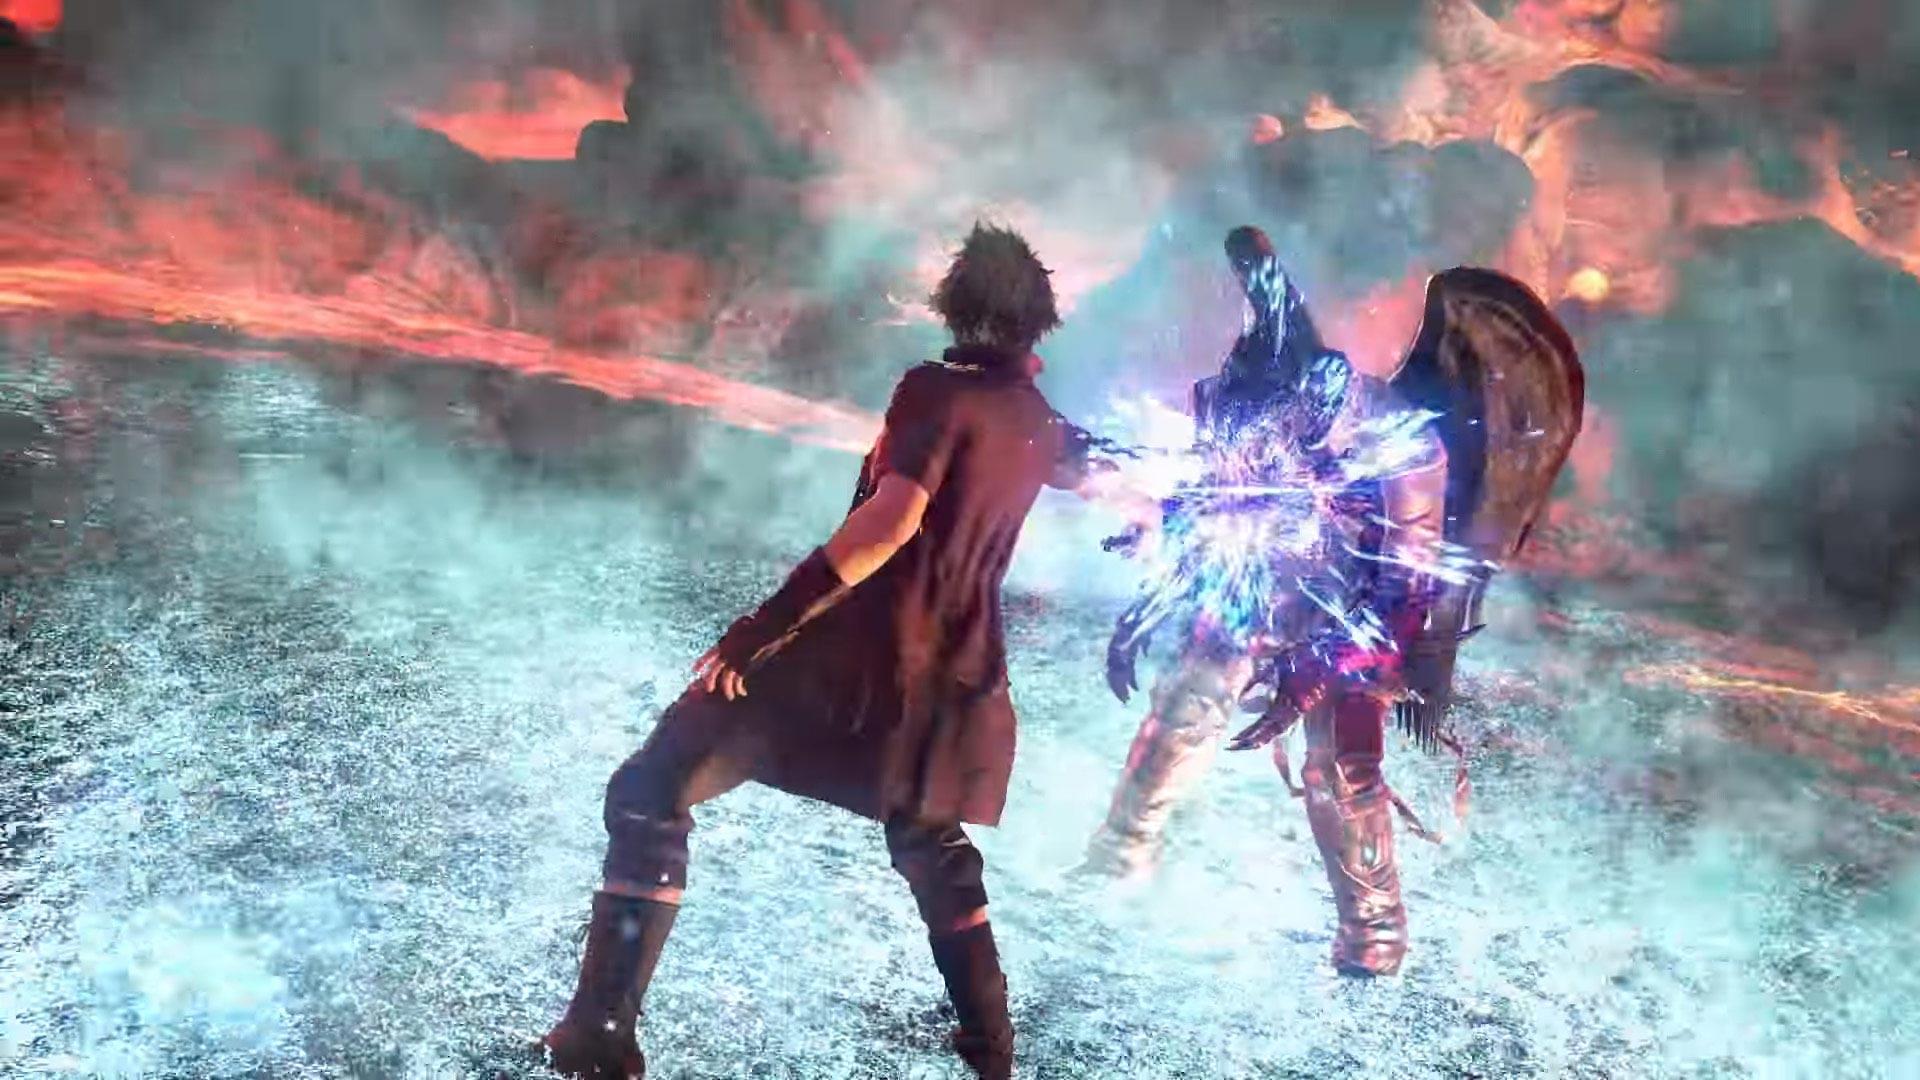 Tekken 7 Noctis Lucis Caelum Reveal Screenshots 4 out of 9 image gallery